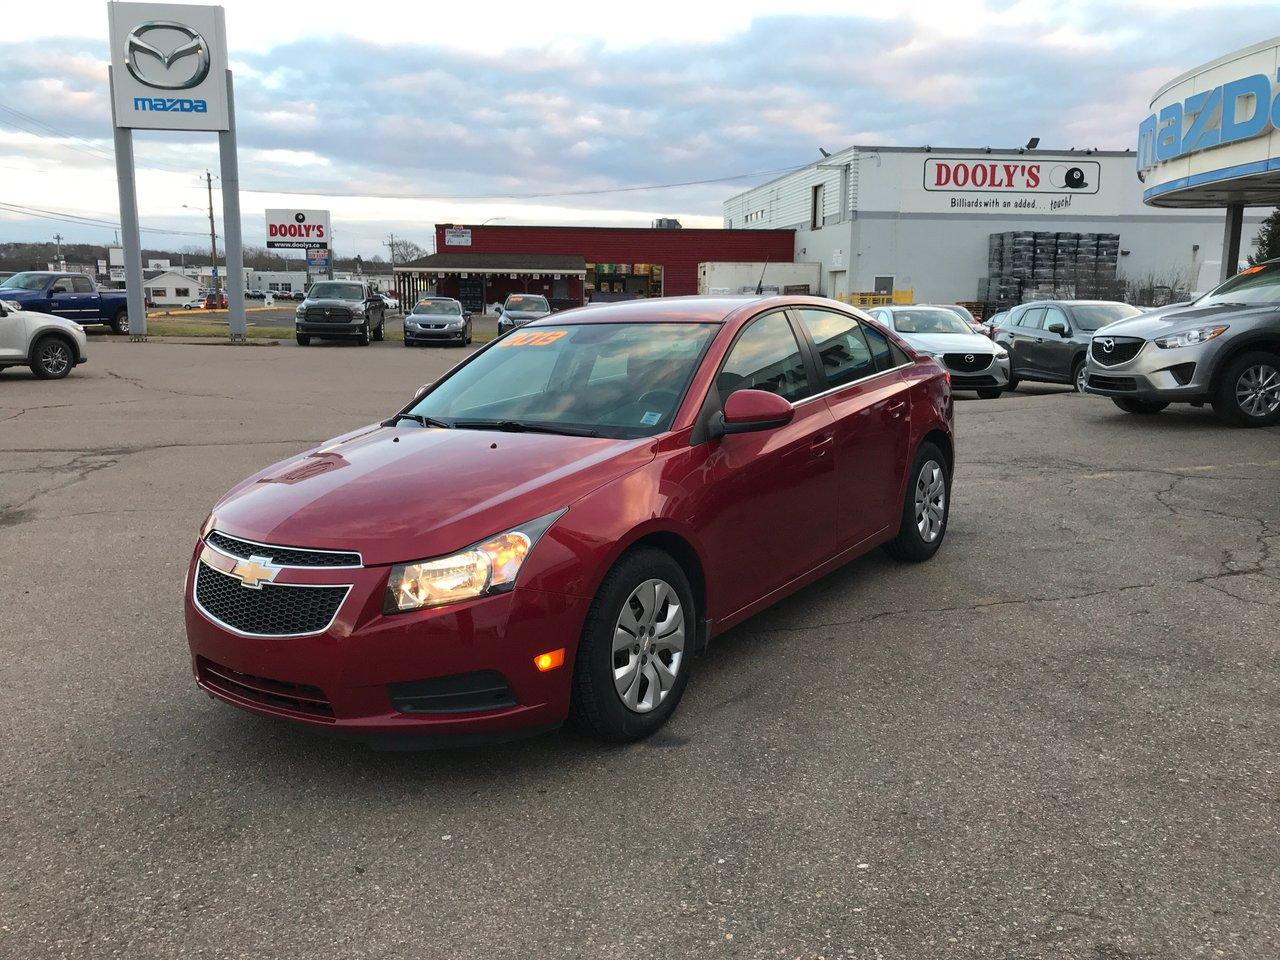 Photo 2013 Chevrolet Cruze LT TURBO! ONLY 33,000KM! SUPER LOW PAYMENTS! LT TURBO! ONLY 33,000KM! SUPER LOW PAYMENTS!